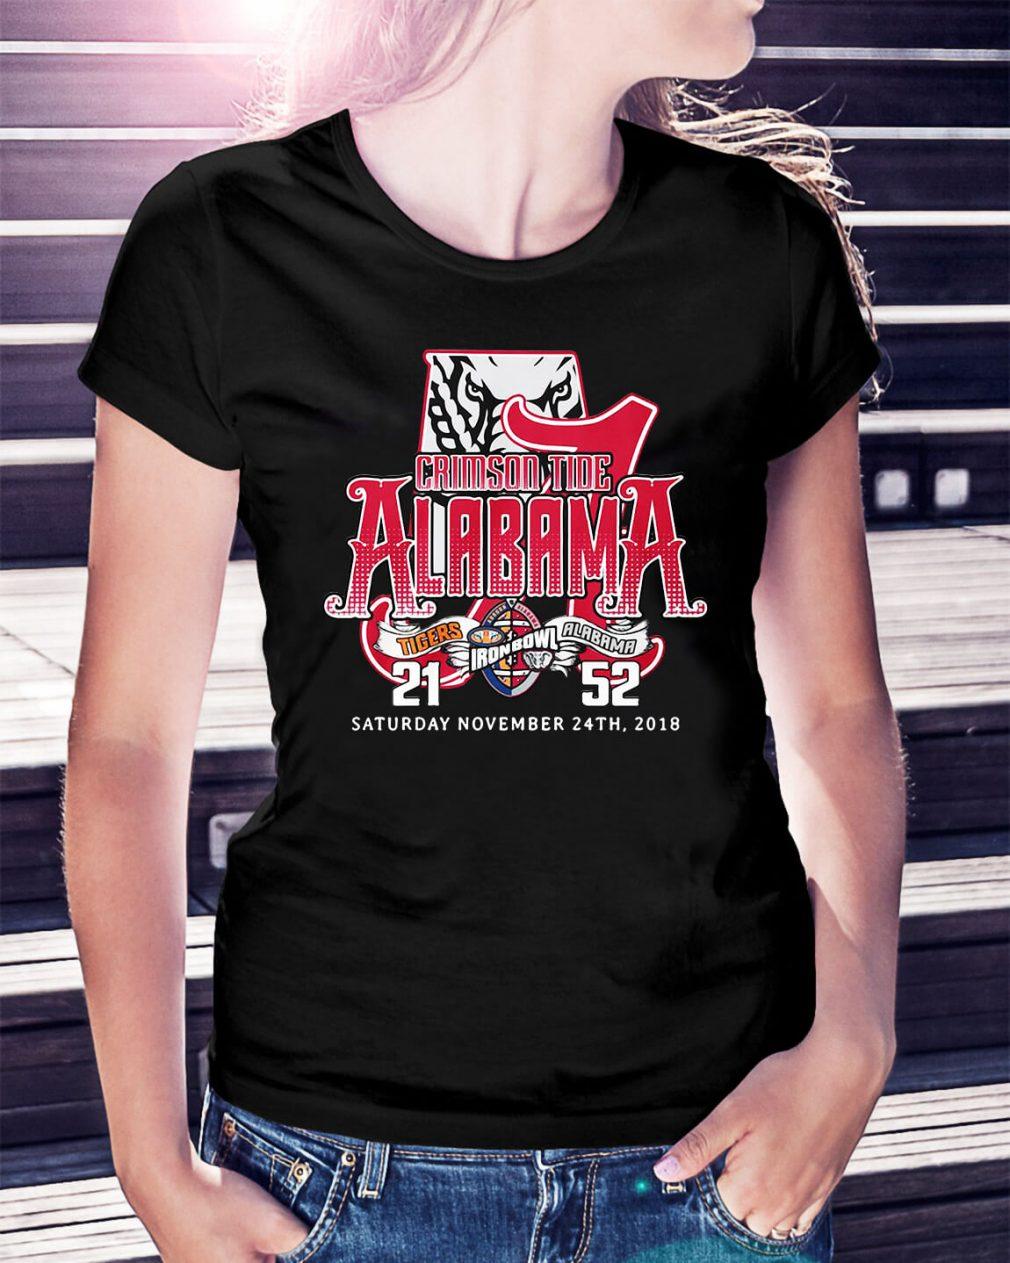 Crimson tide Alabama Saturday November 24th 2018 Ladies Tee